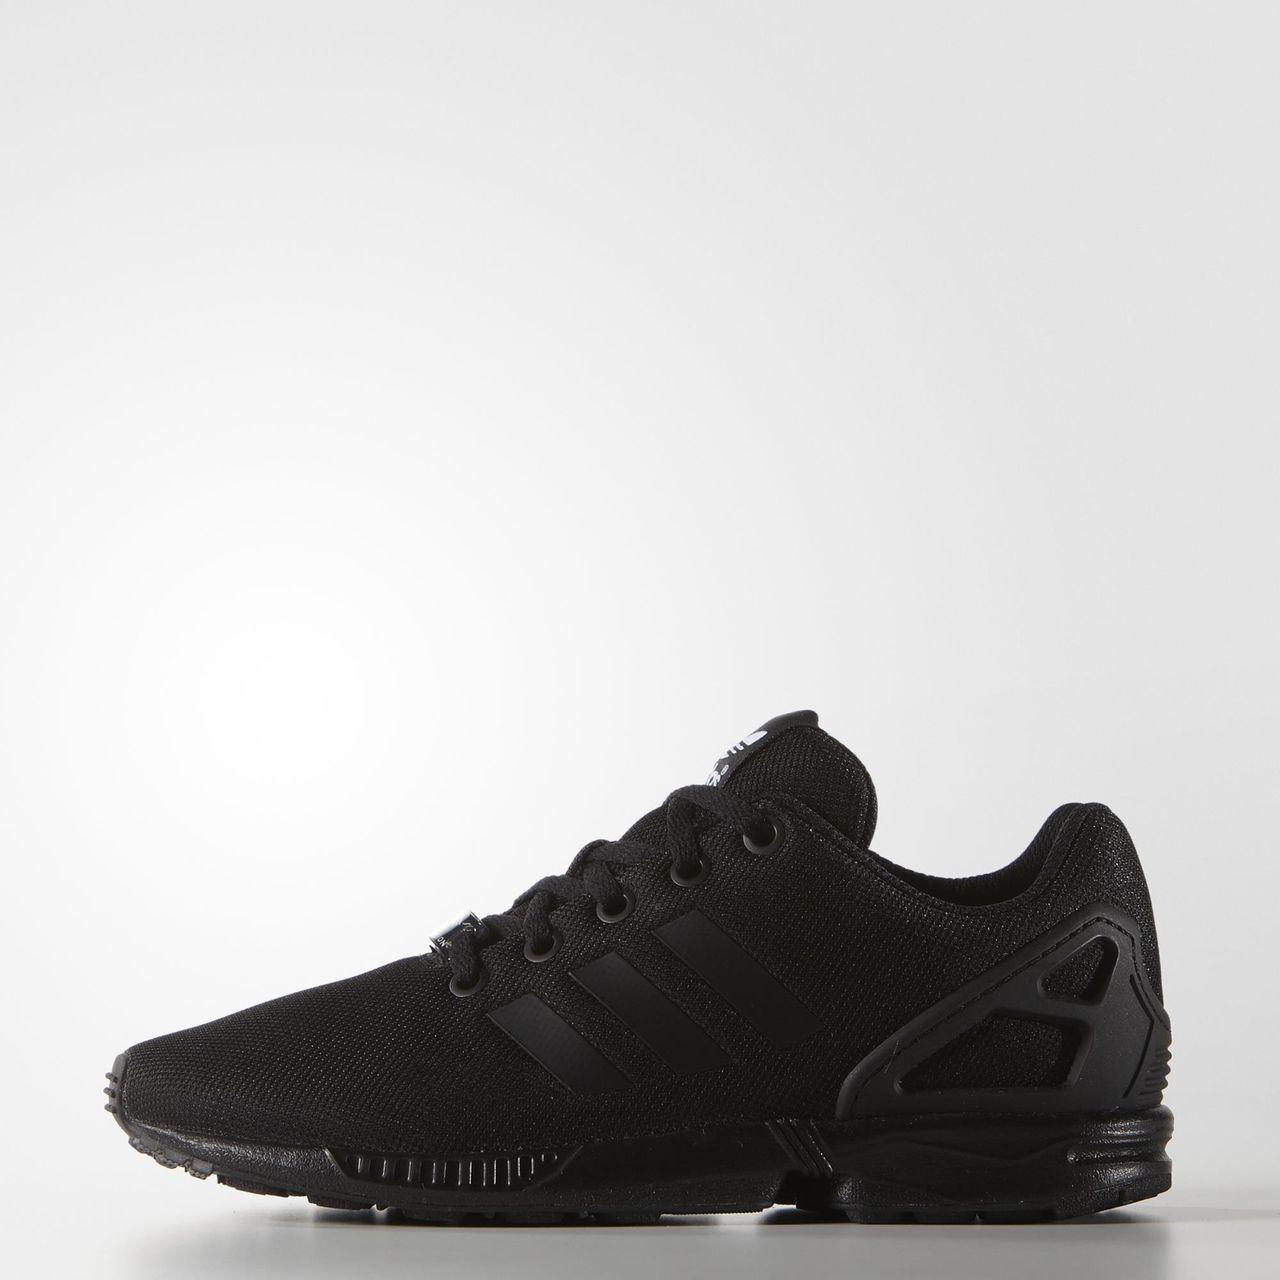 magasin en ligne f72e6 c4acc ZX Flux Shoes | Footwear in 2019 | Black adidas, Adidas zx ...